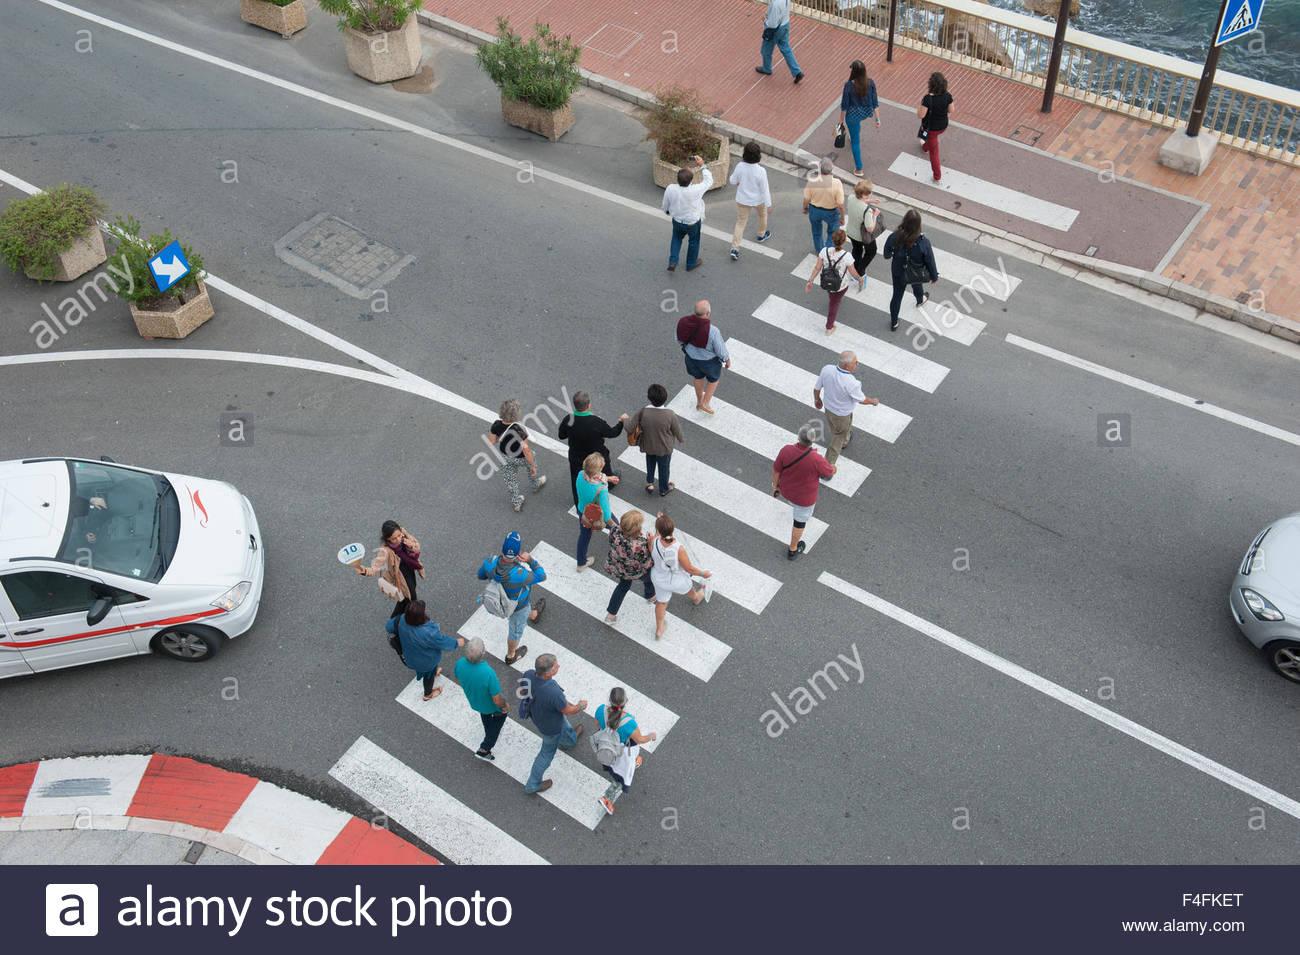 Monte Carlo Monaco Tourists cross a zebra crossing. Stock Photo